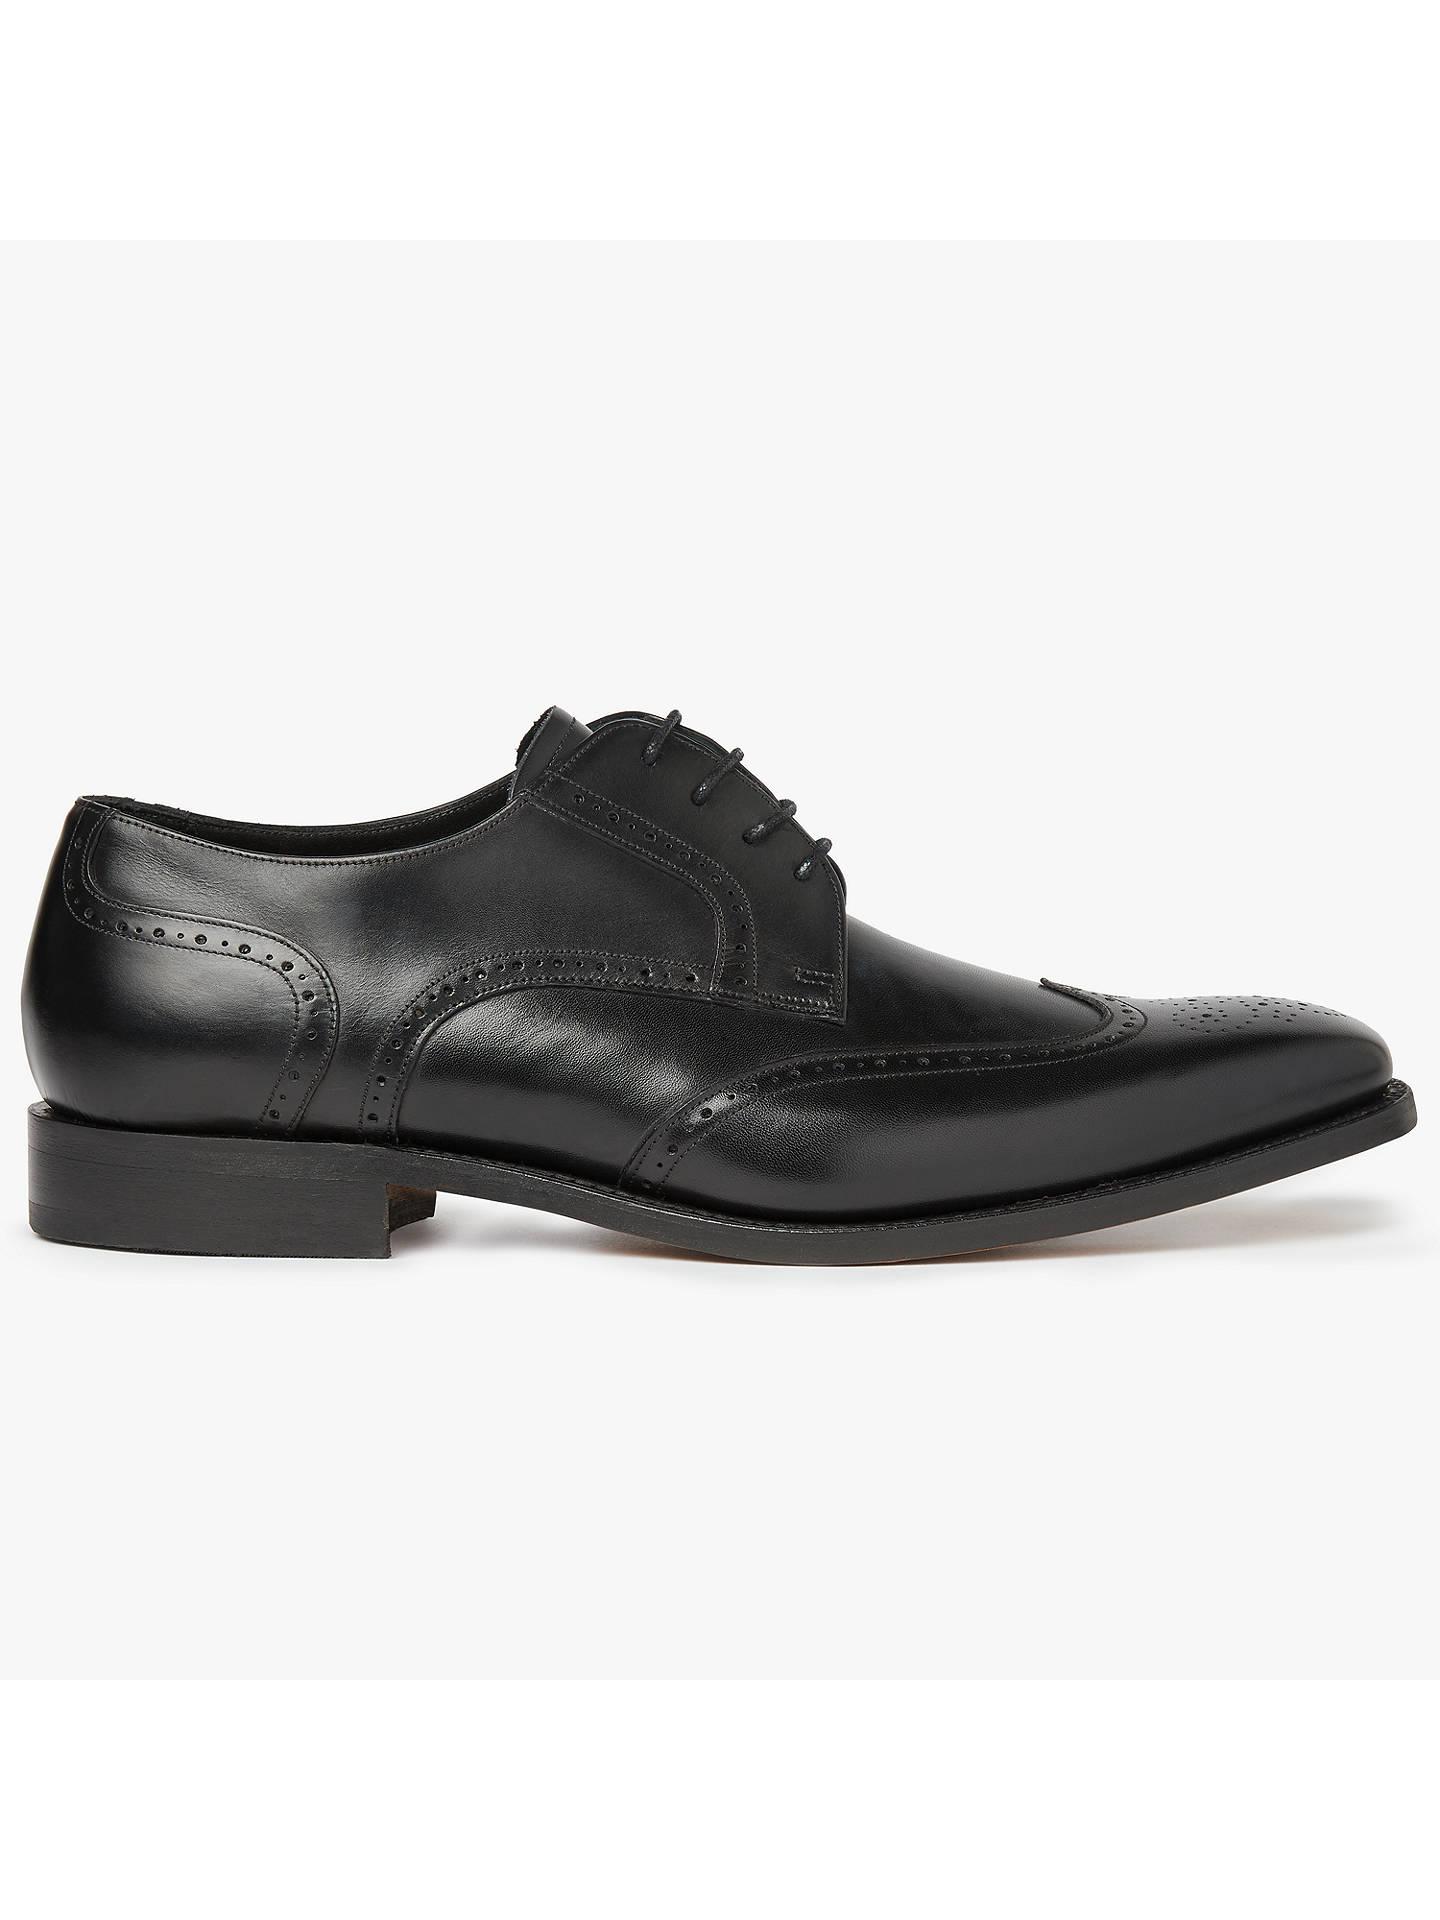 00cb7e90fb6 Barker Jordan Wingtip Leather Derby Shoes at John Lewis & Partners